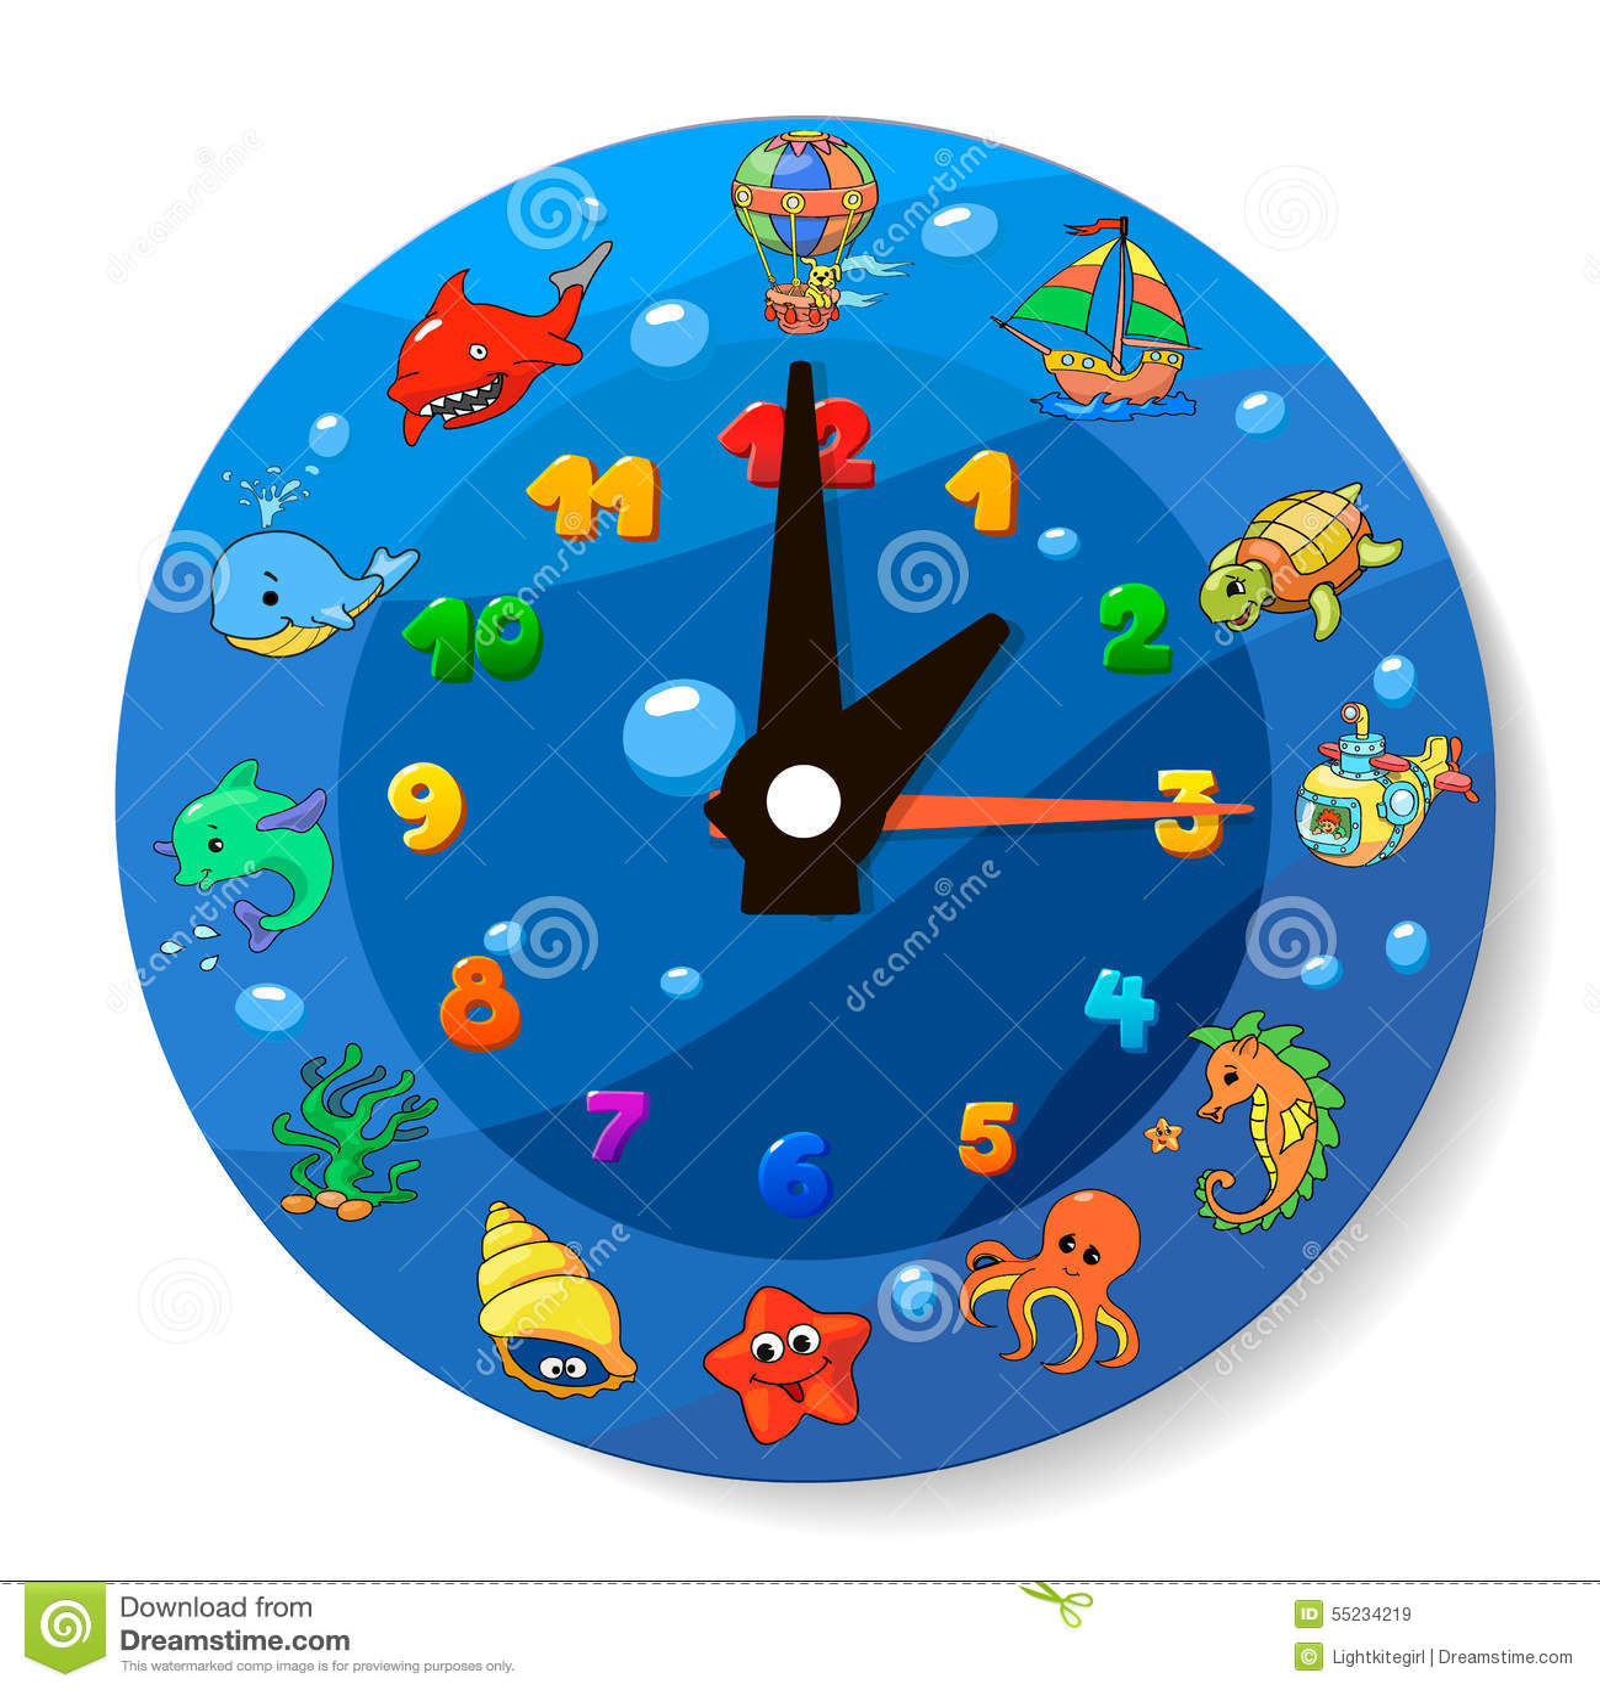 Worksheet Clock For Kids clock for kids stock illustration image 46472471 funny cartoon royalty free images